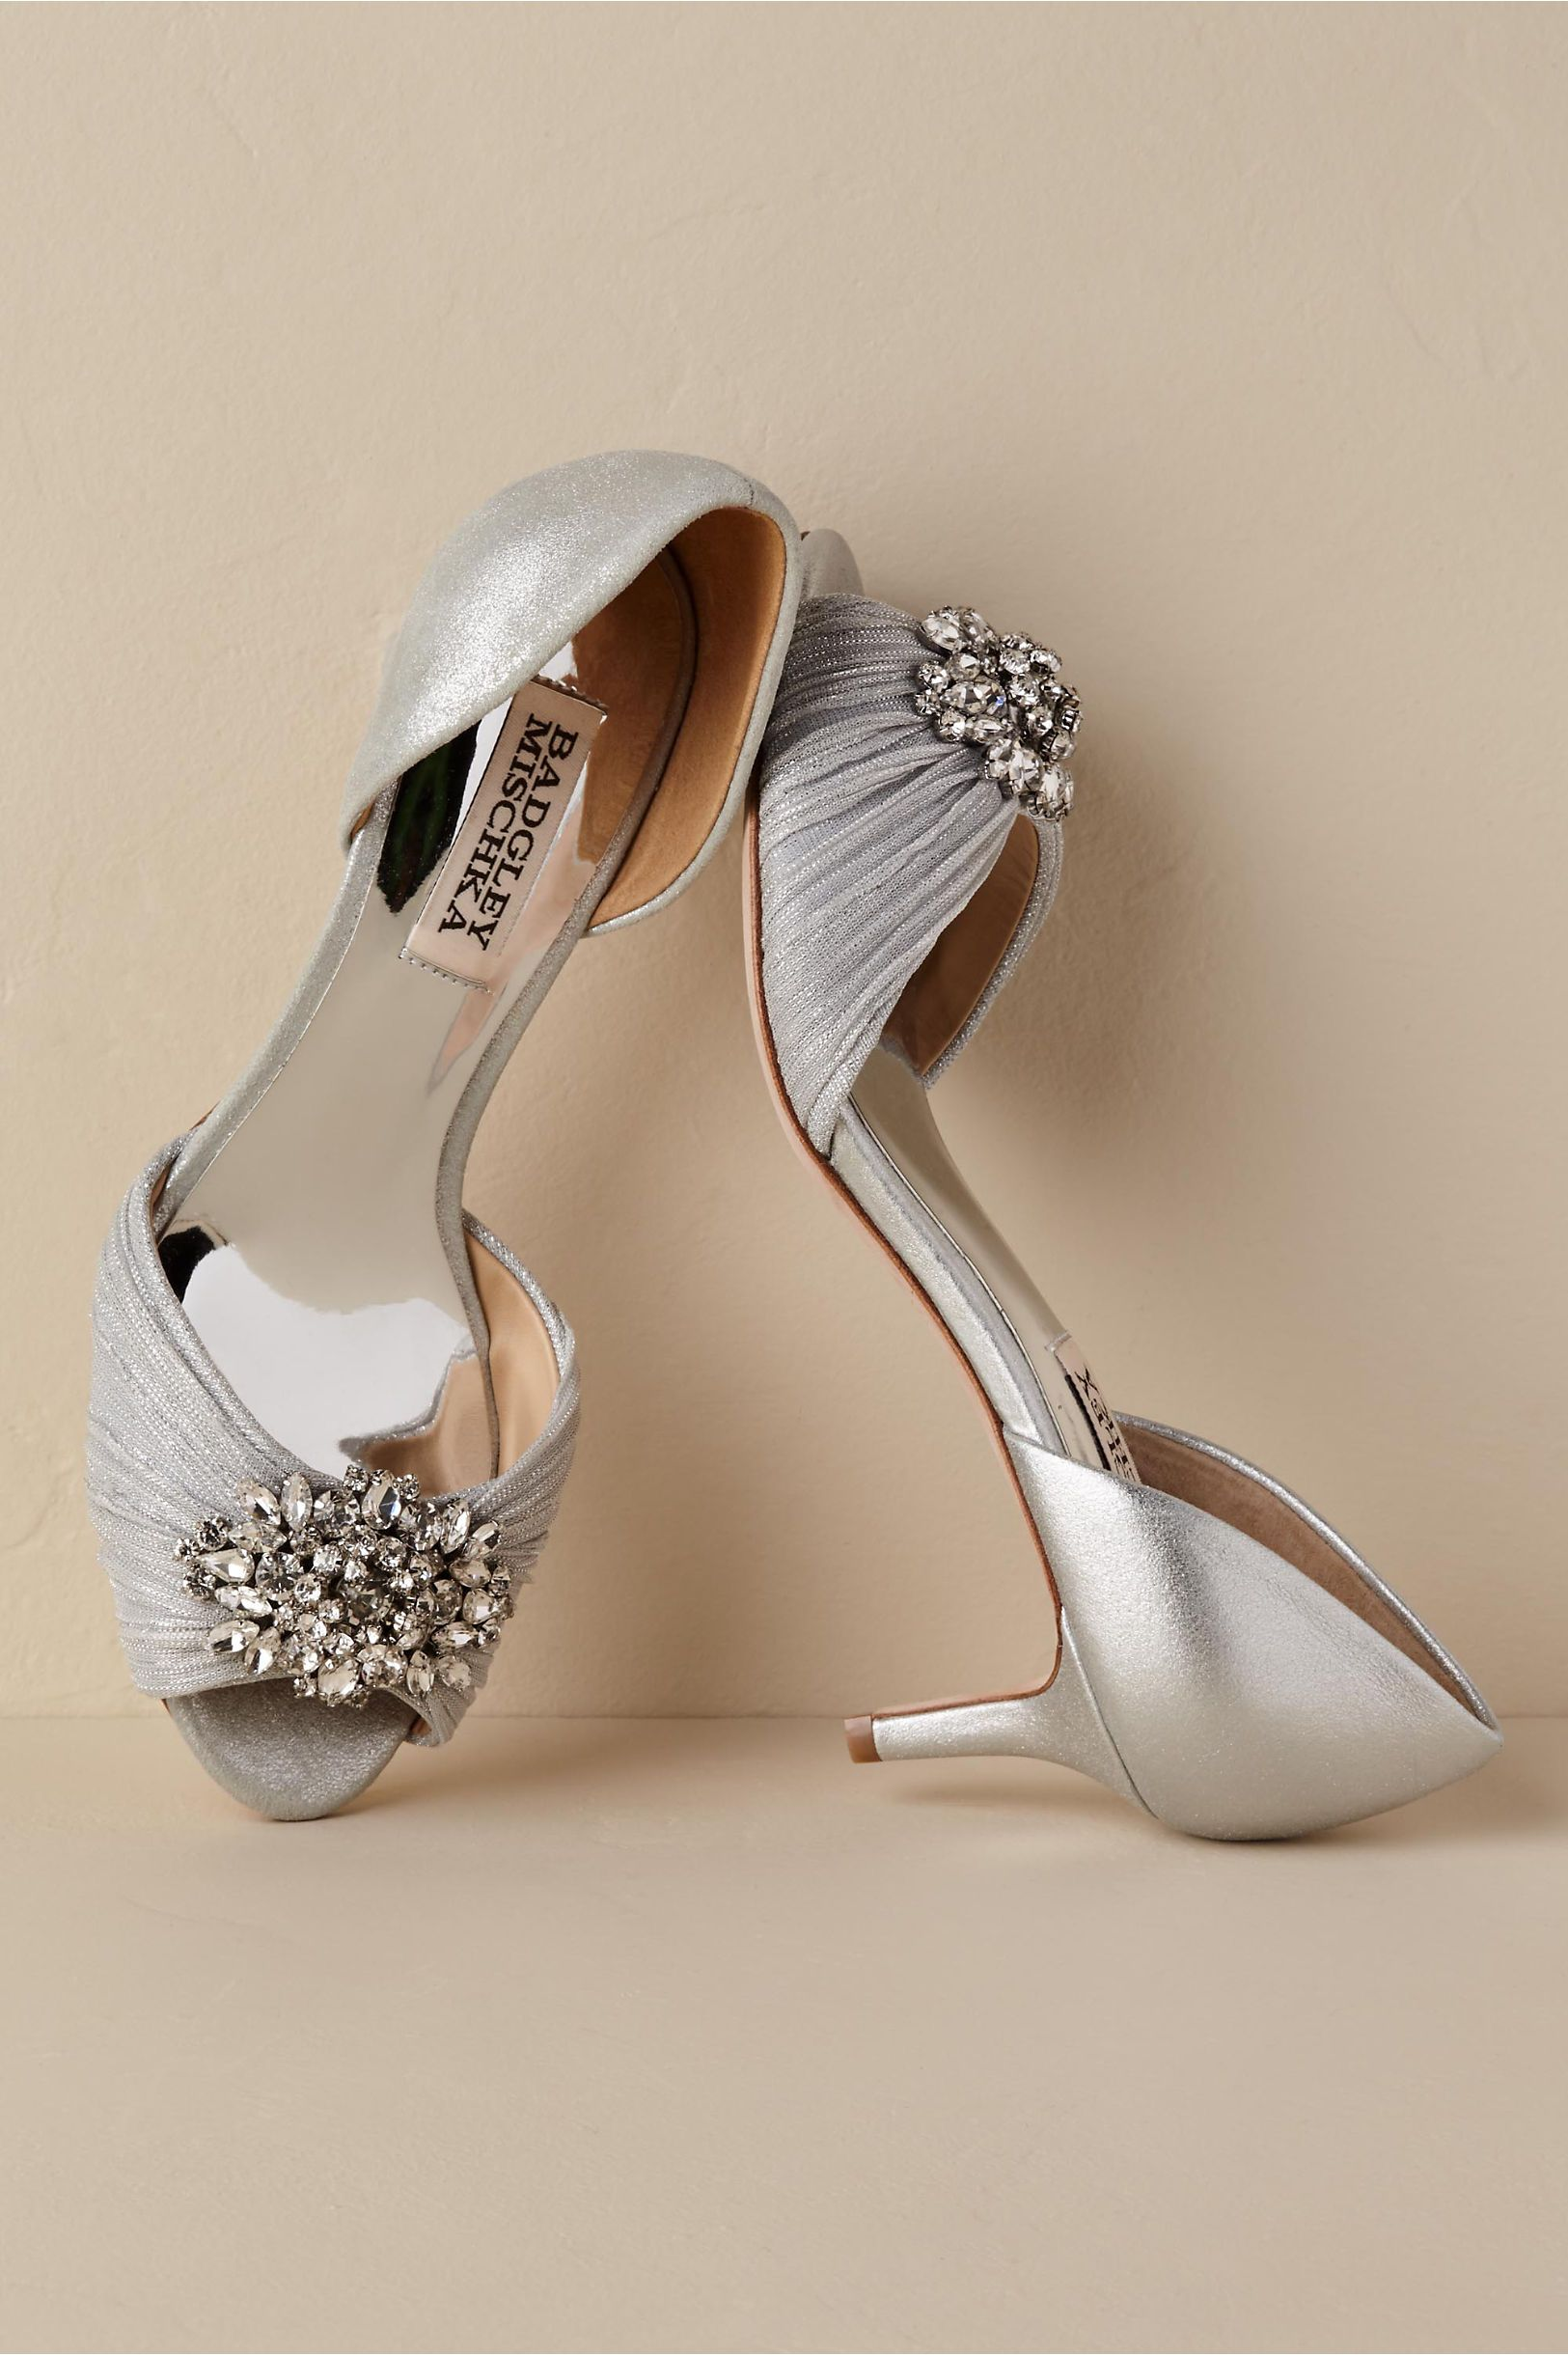 adc1a4ed7cd BHLDN s Badgley Mischka Sabine Heels in Silver